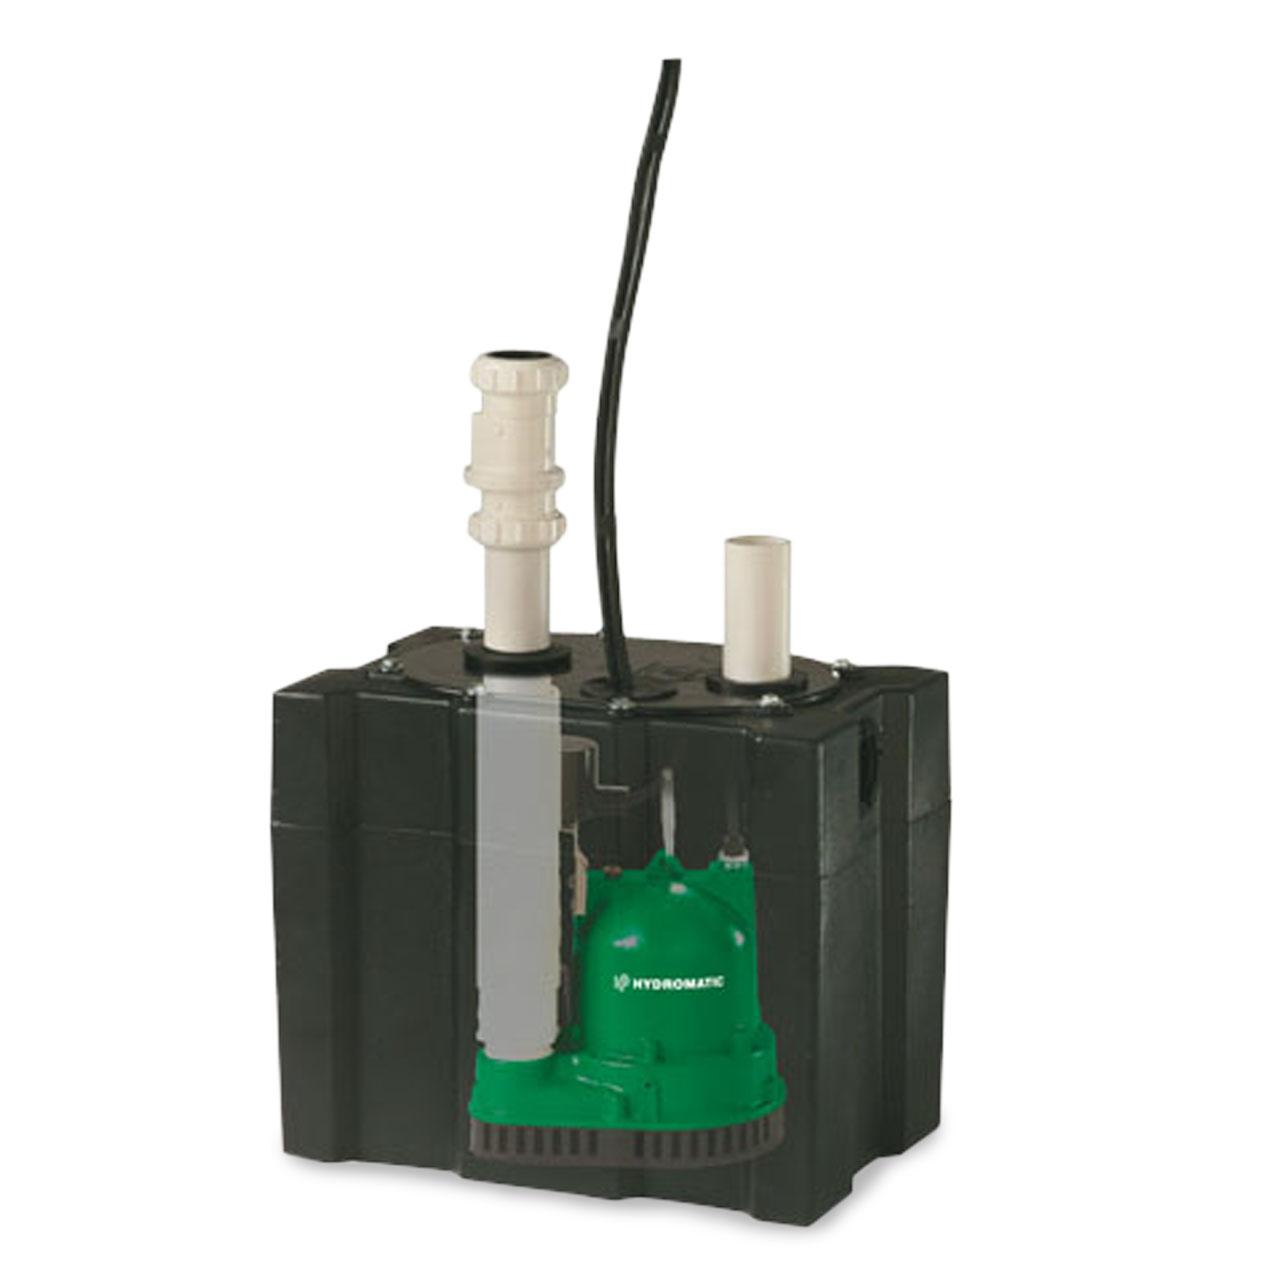 Hydromatic Sump Pump Basin Sump Pump Basins For Sale